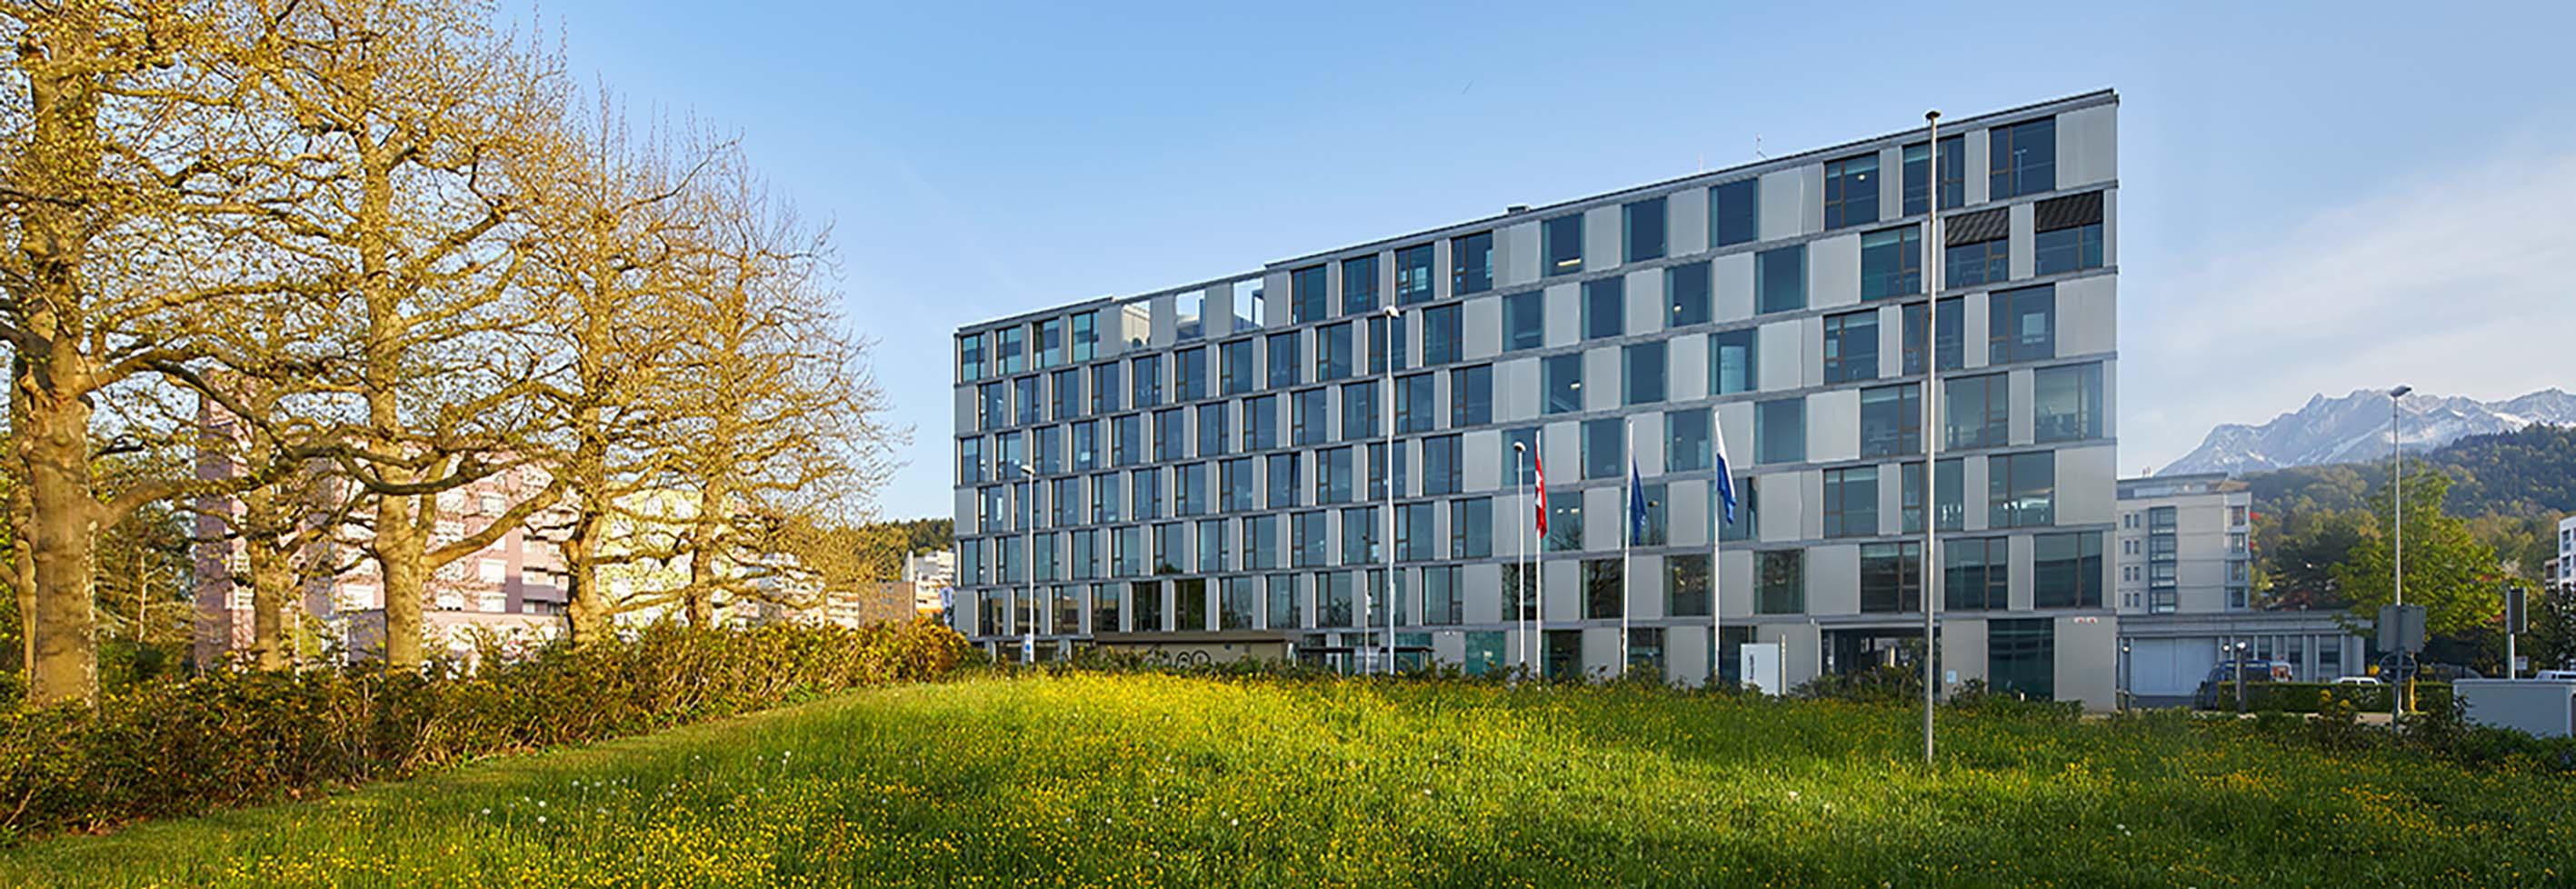 Haus der Informatik